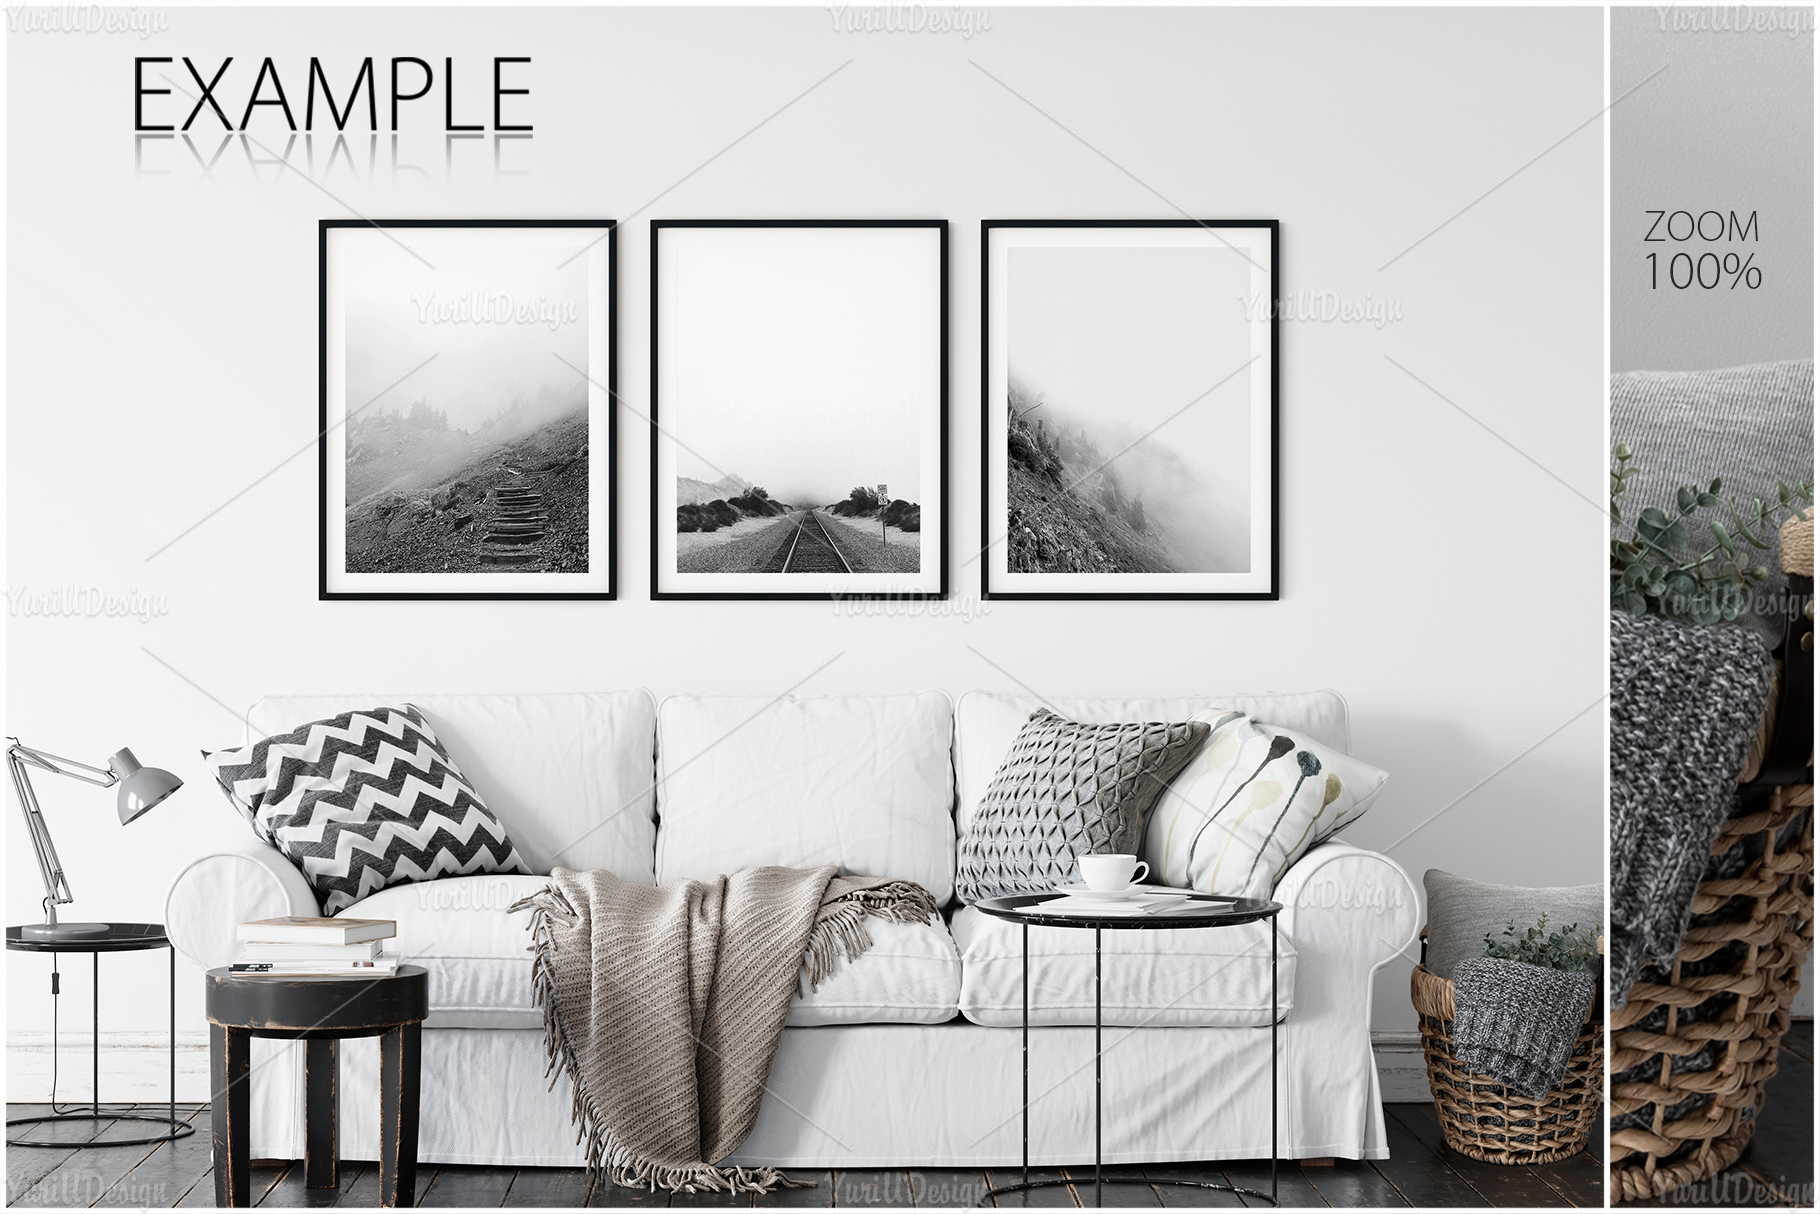 Scandinavian Interior Frames & Walls Mockup Bundle - 3 example image 11